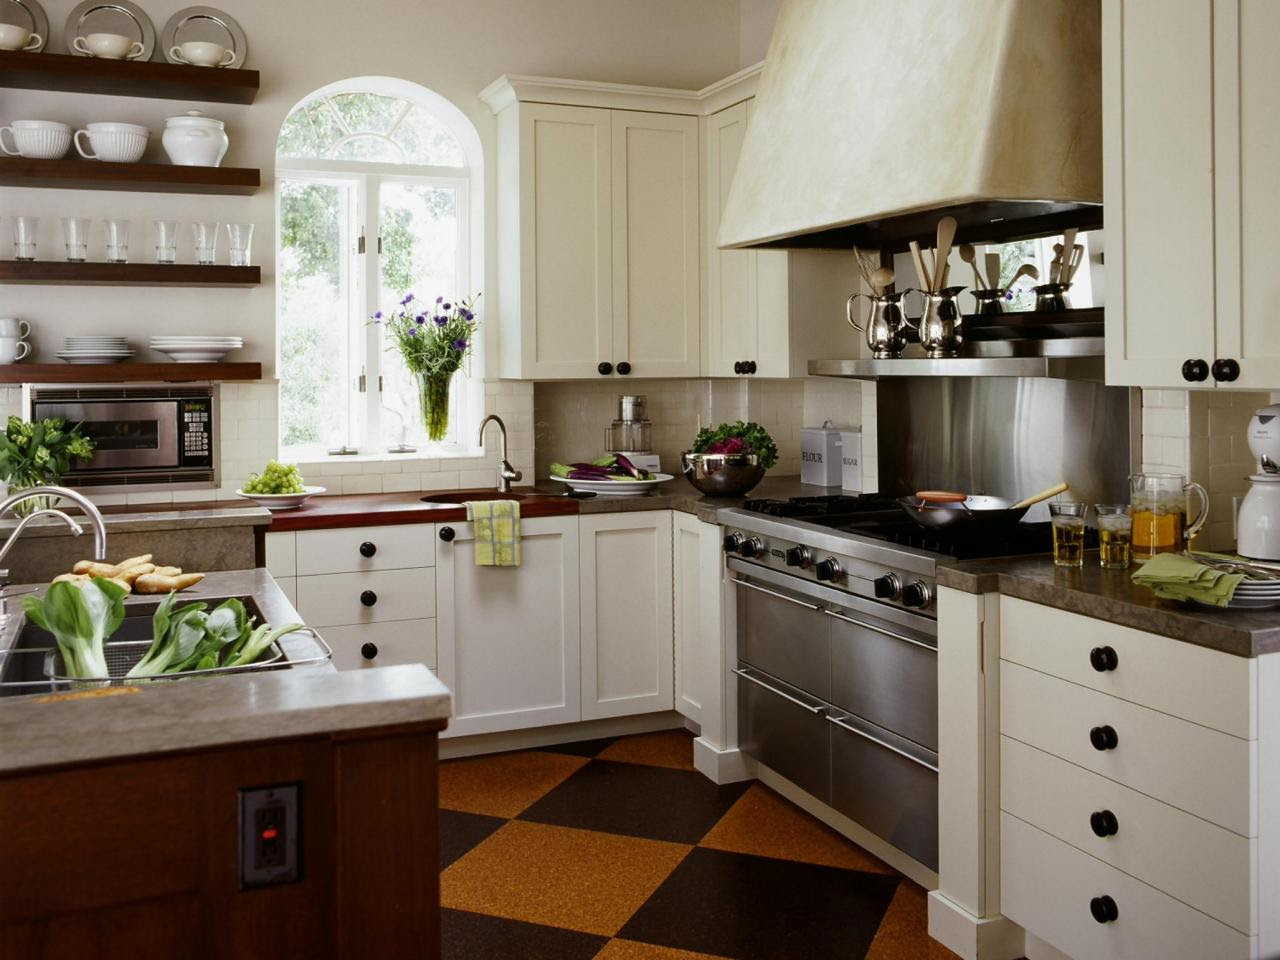 Our 50 Favorite White Kitchens  Kitchen Ideas  Design with Cabinets, Islands, Backsplashes  HGTV